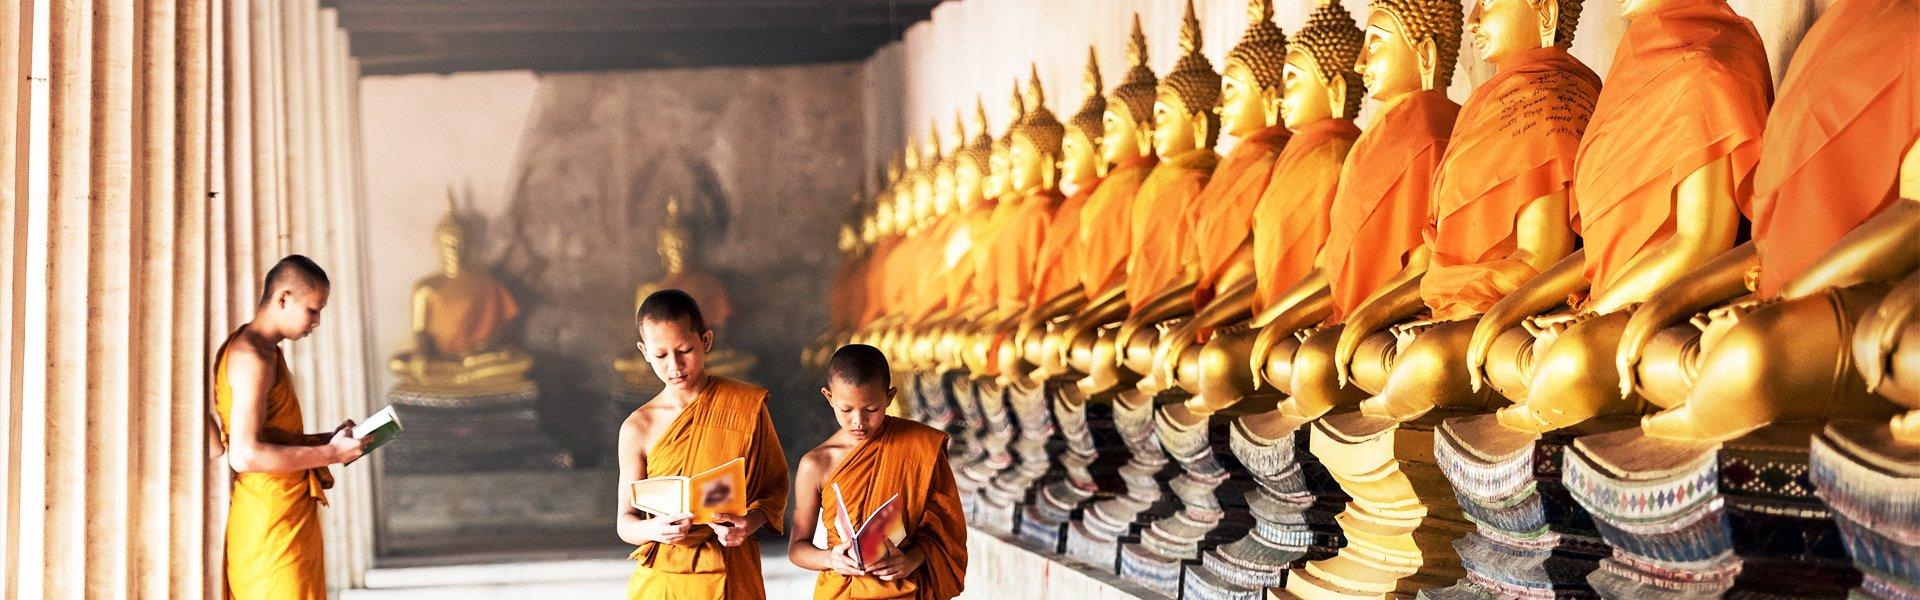 Banner Laos